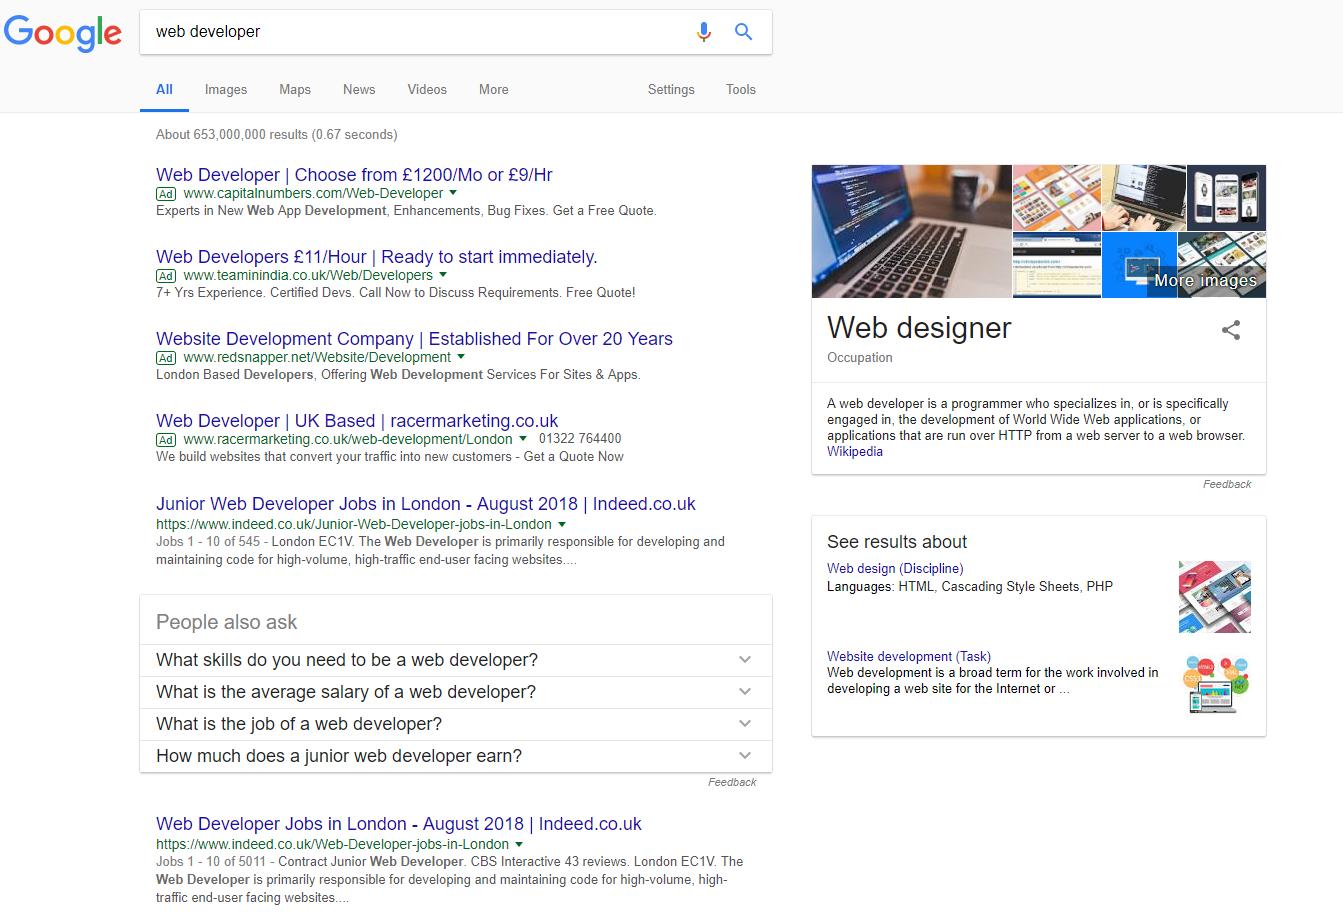 Search results for 'web developer'